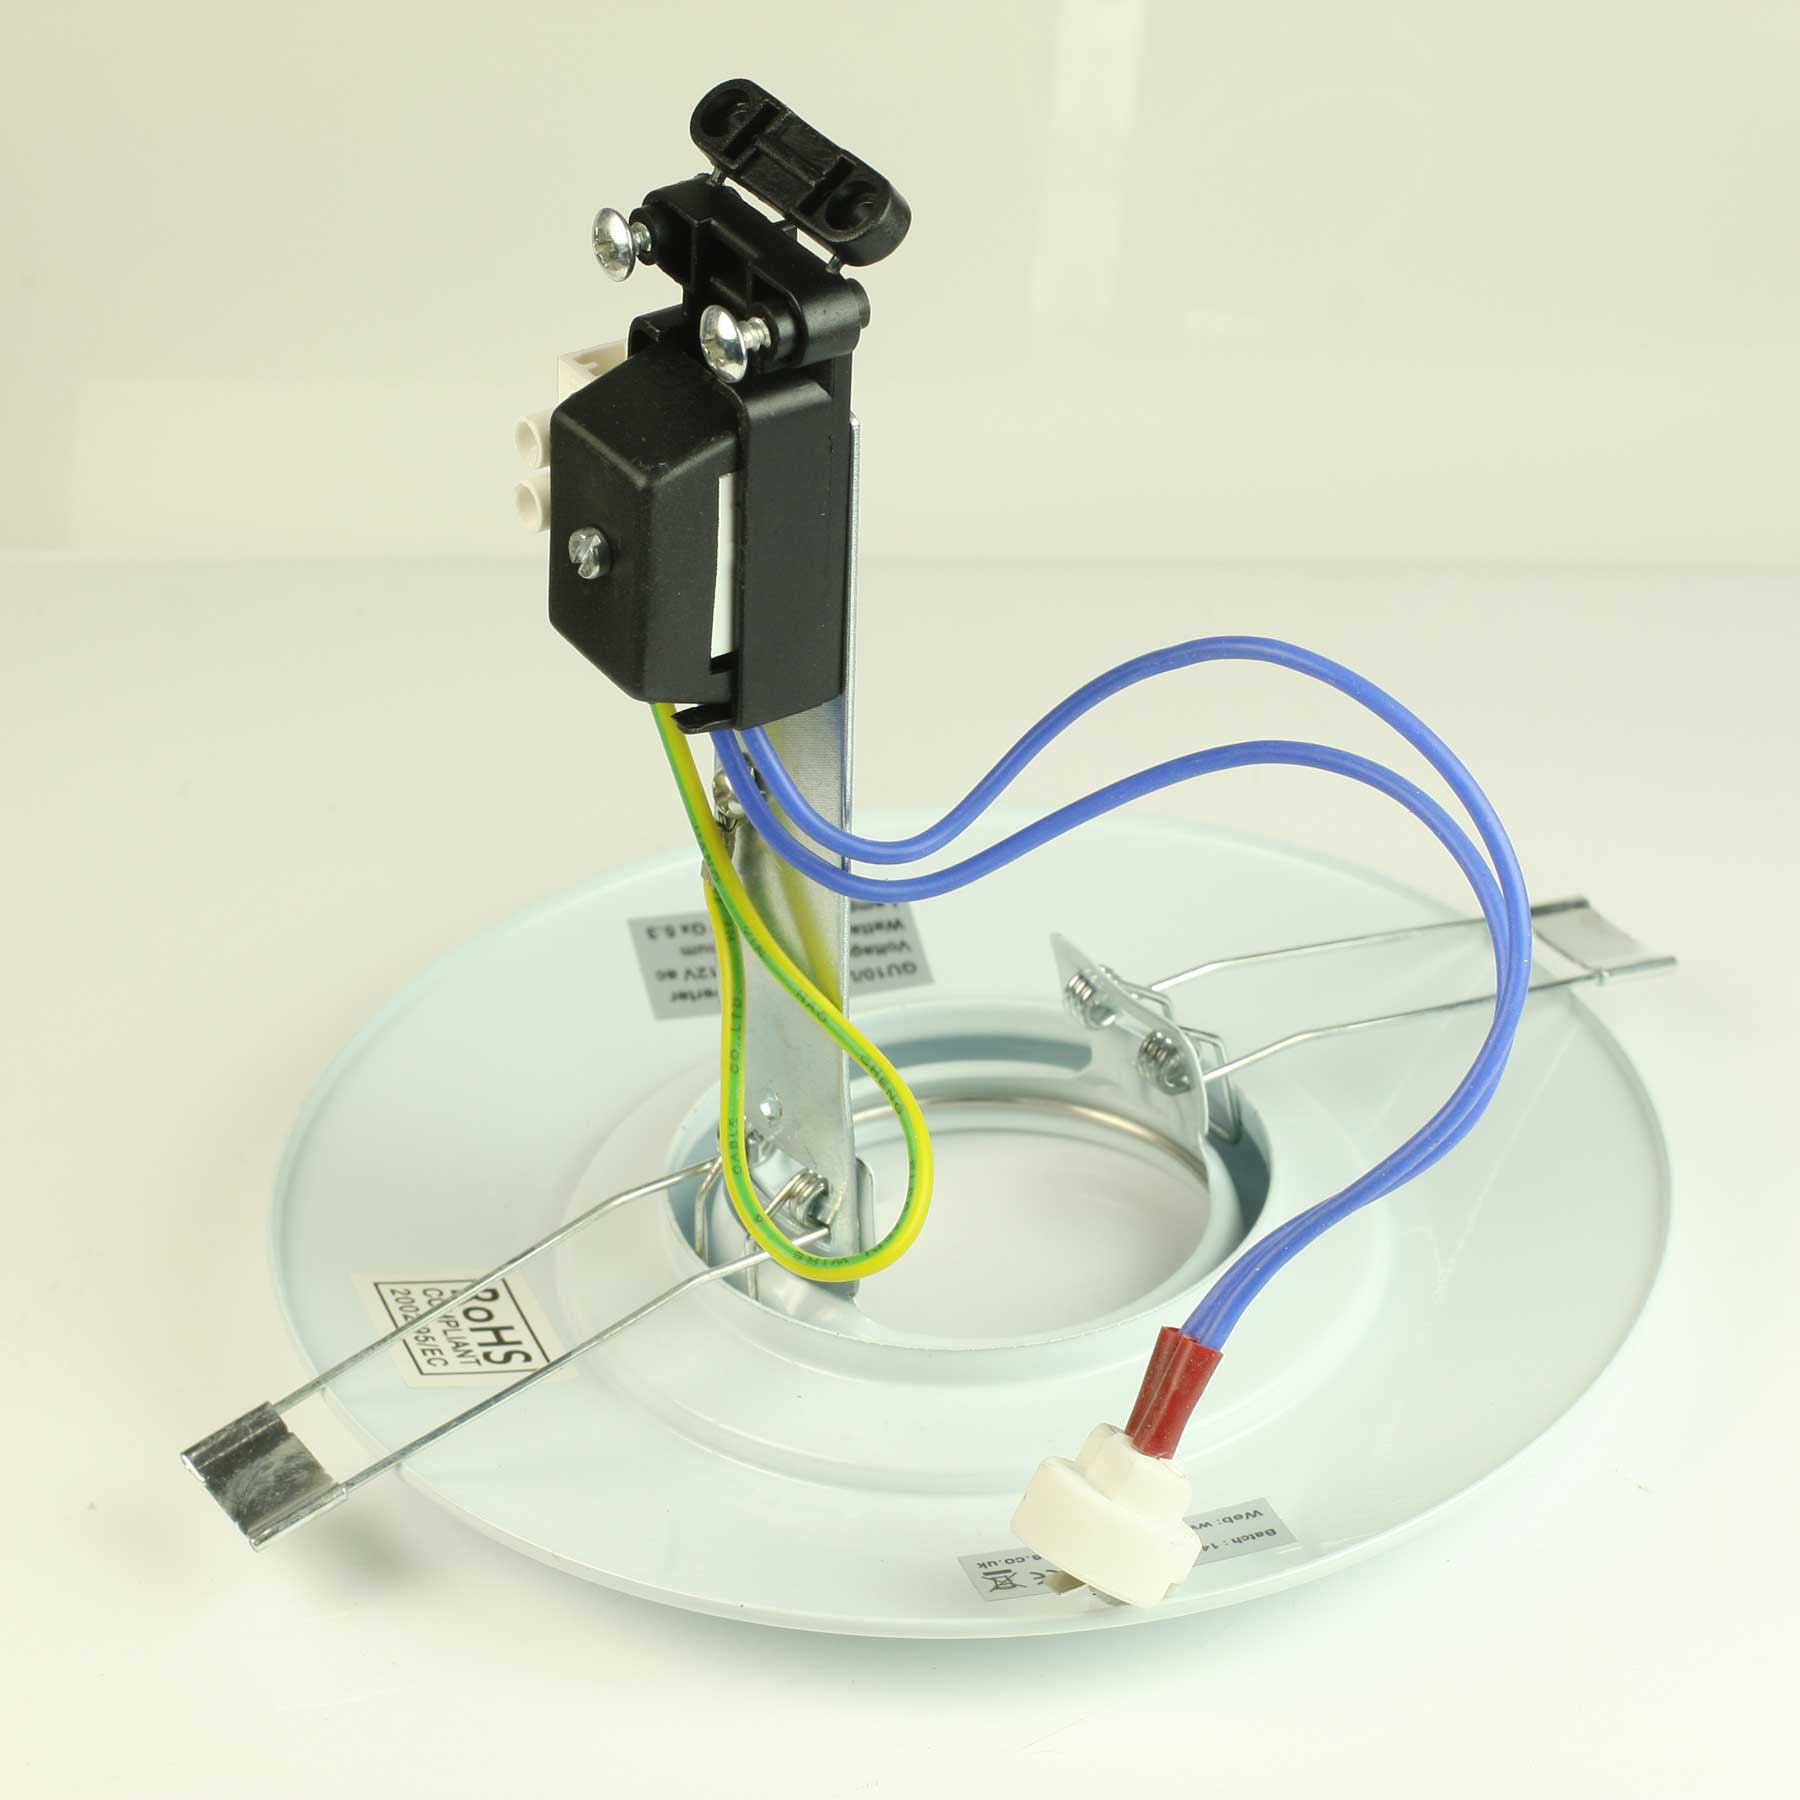 Spotlight Downlight Hole Converter Plate Kit With Warm White Gu10 Cob Led Bulb